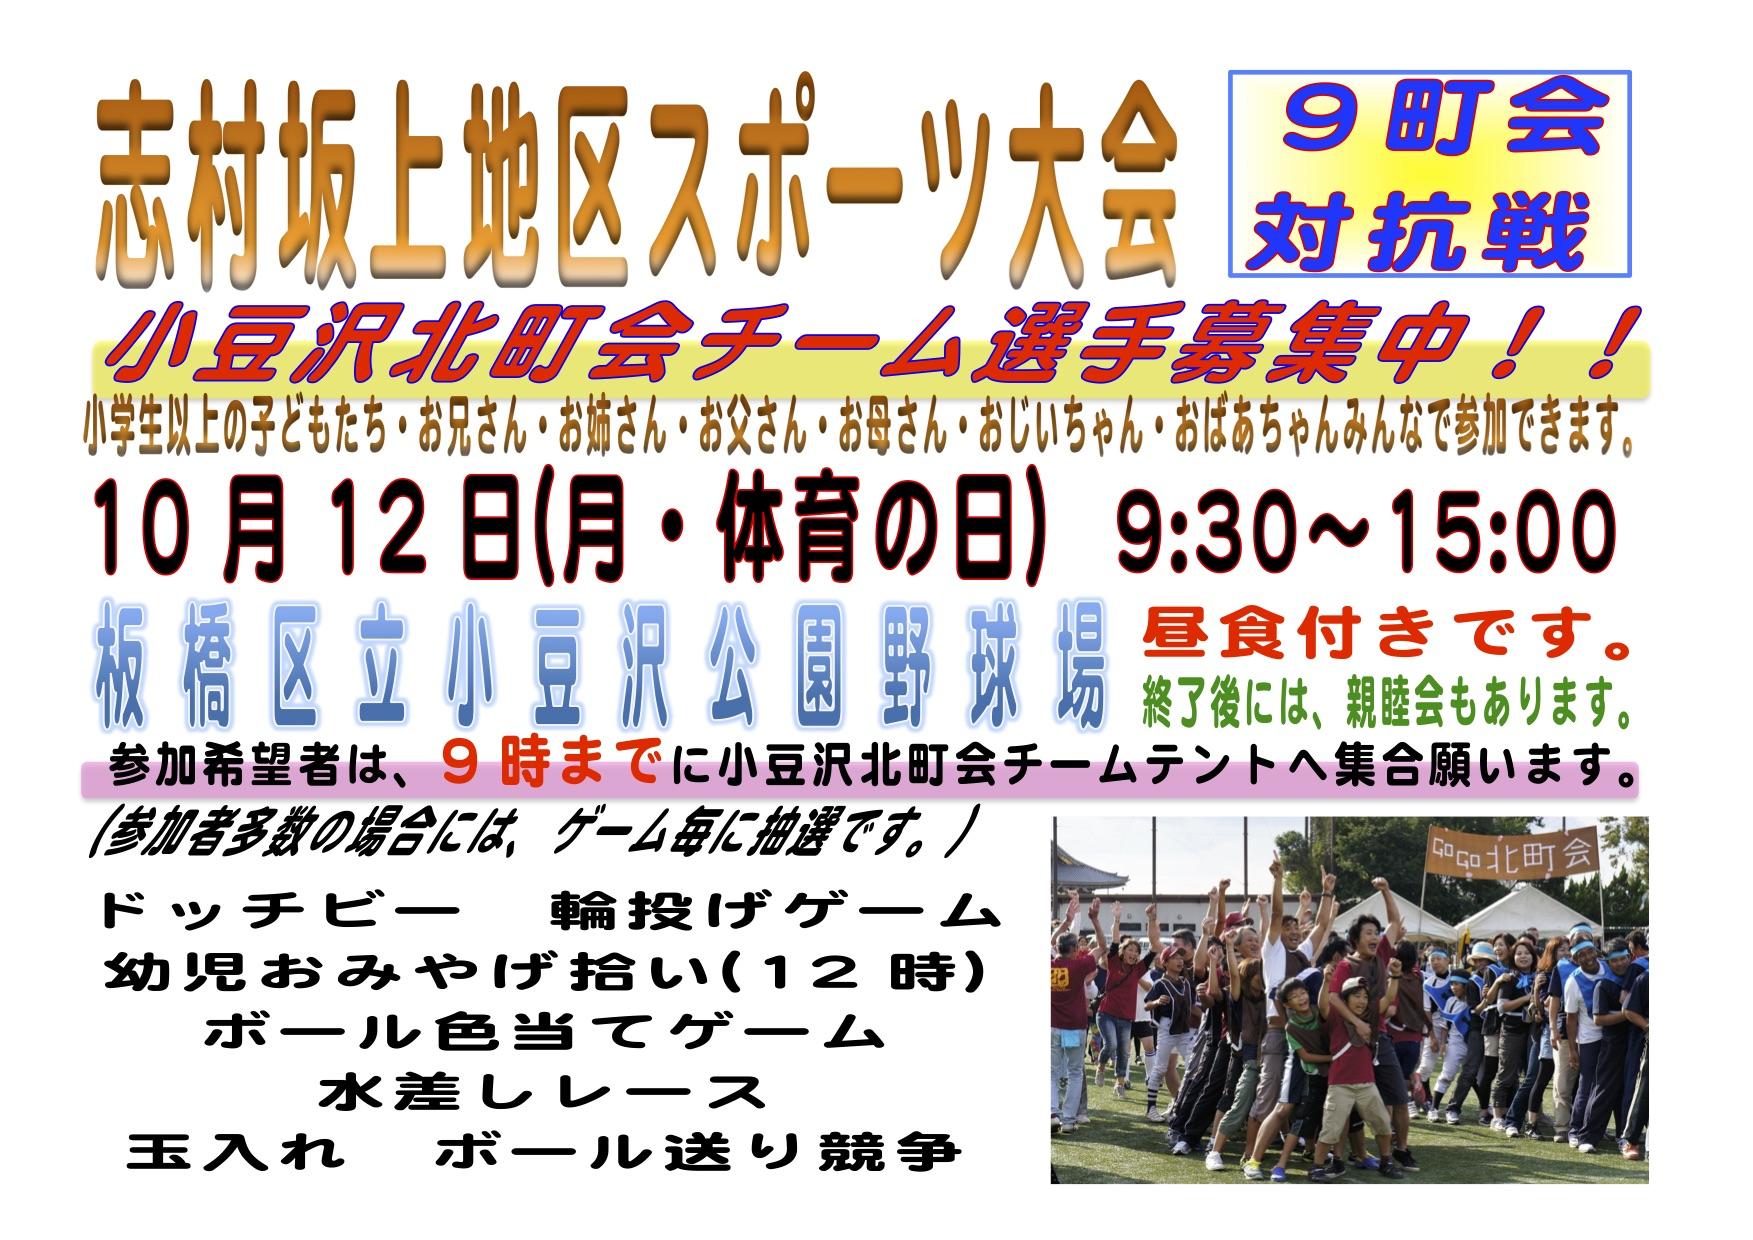 2015年10月12日(月・祝)志村坂上地区スポーツ大会